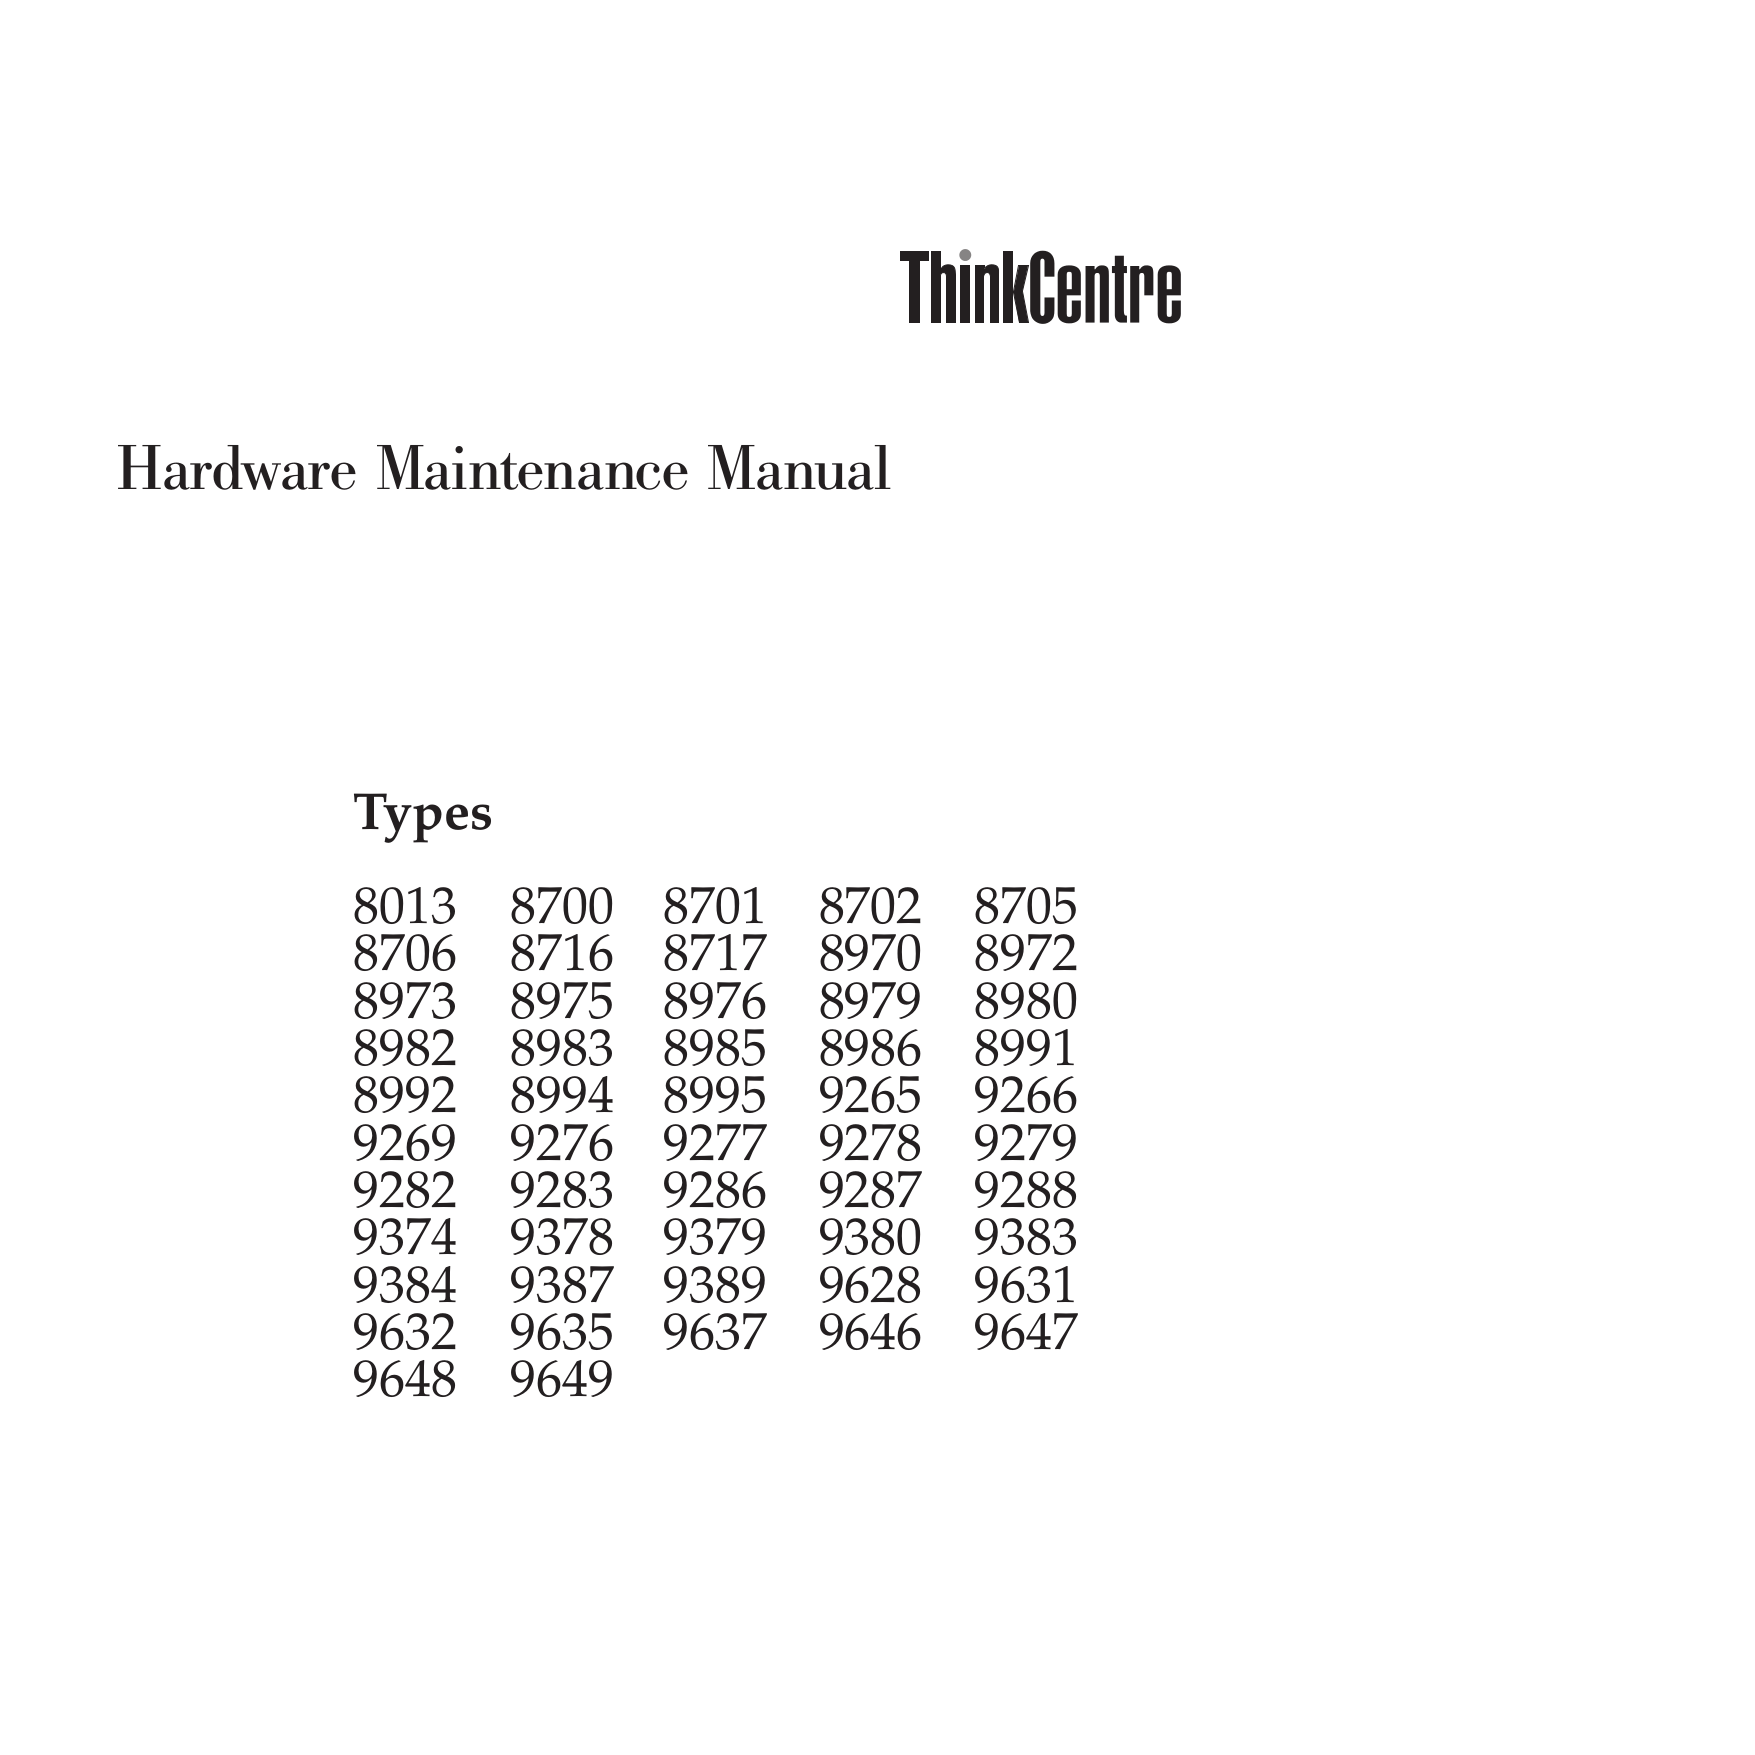 pdf for Lenovo Desktop ThinkCentre M55e 9389 manual